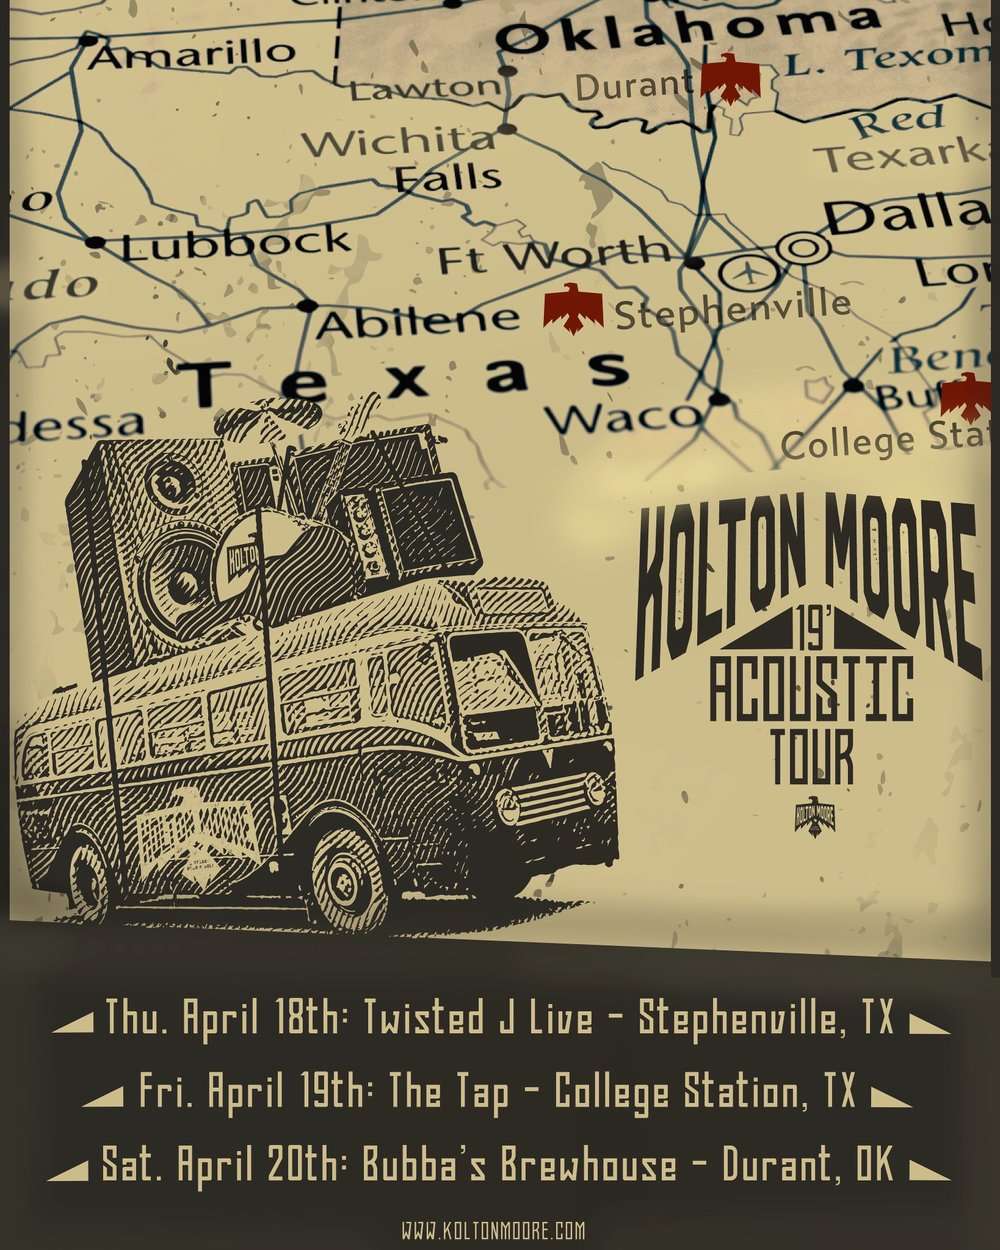 kolton-moore-texas-tour-2019.jpg